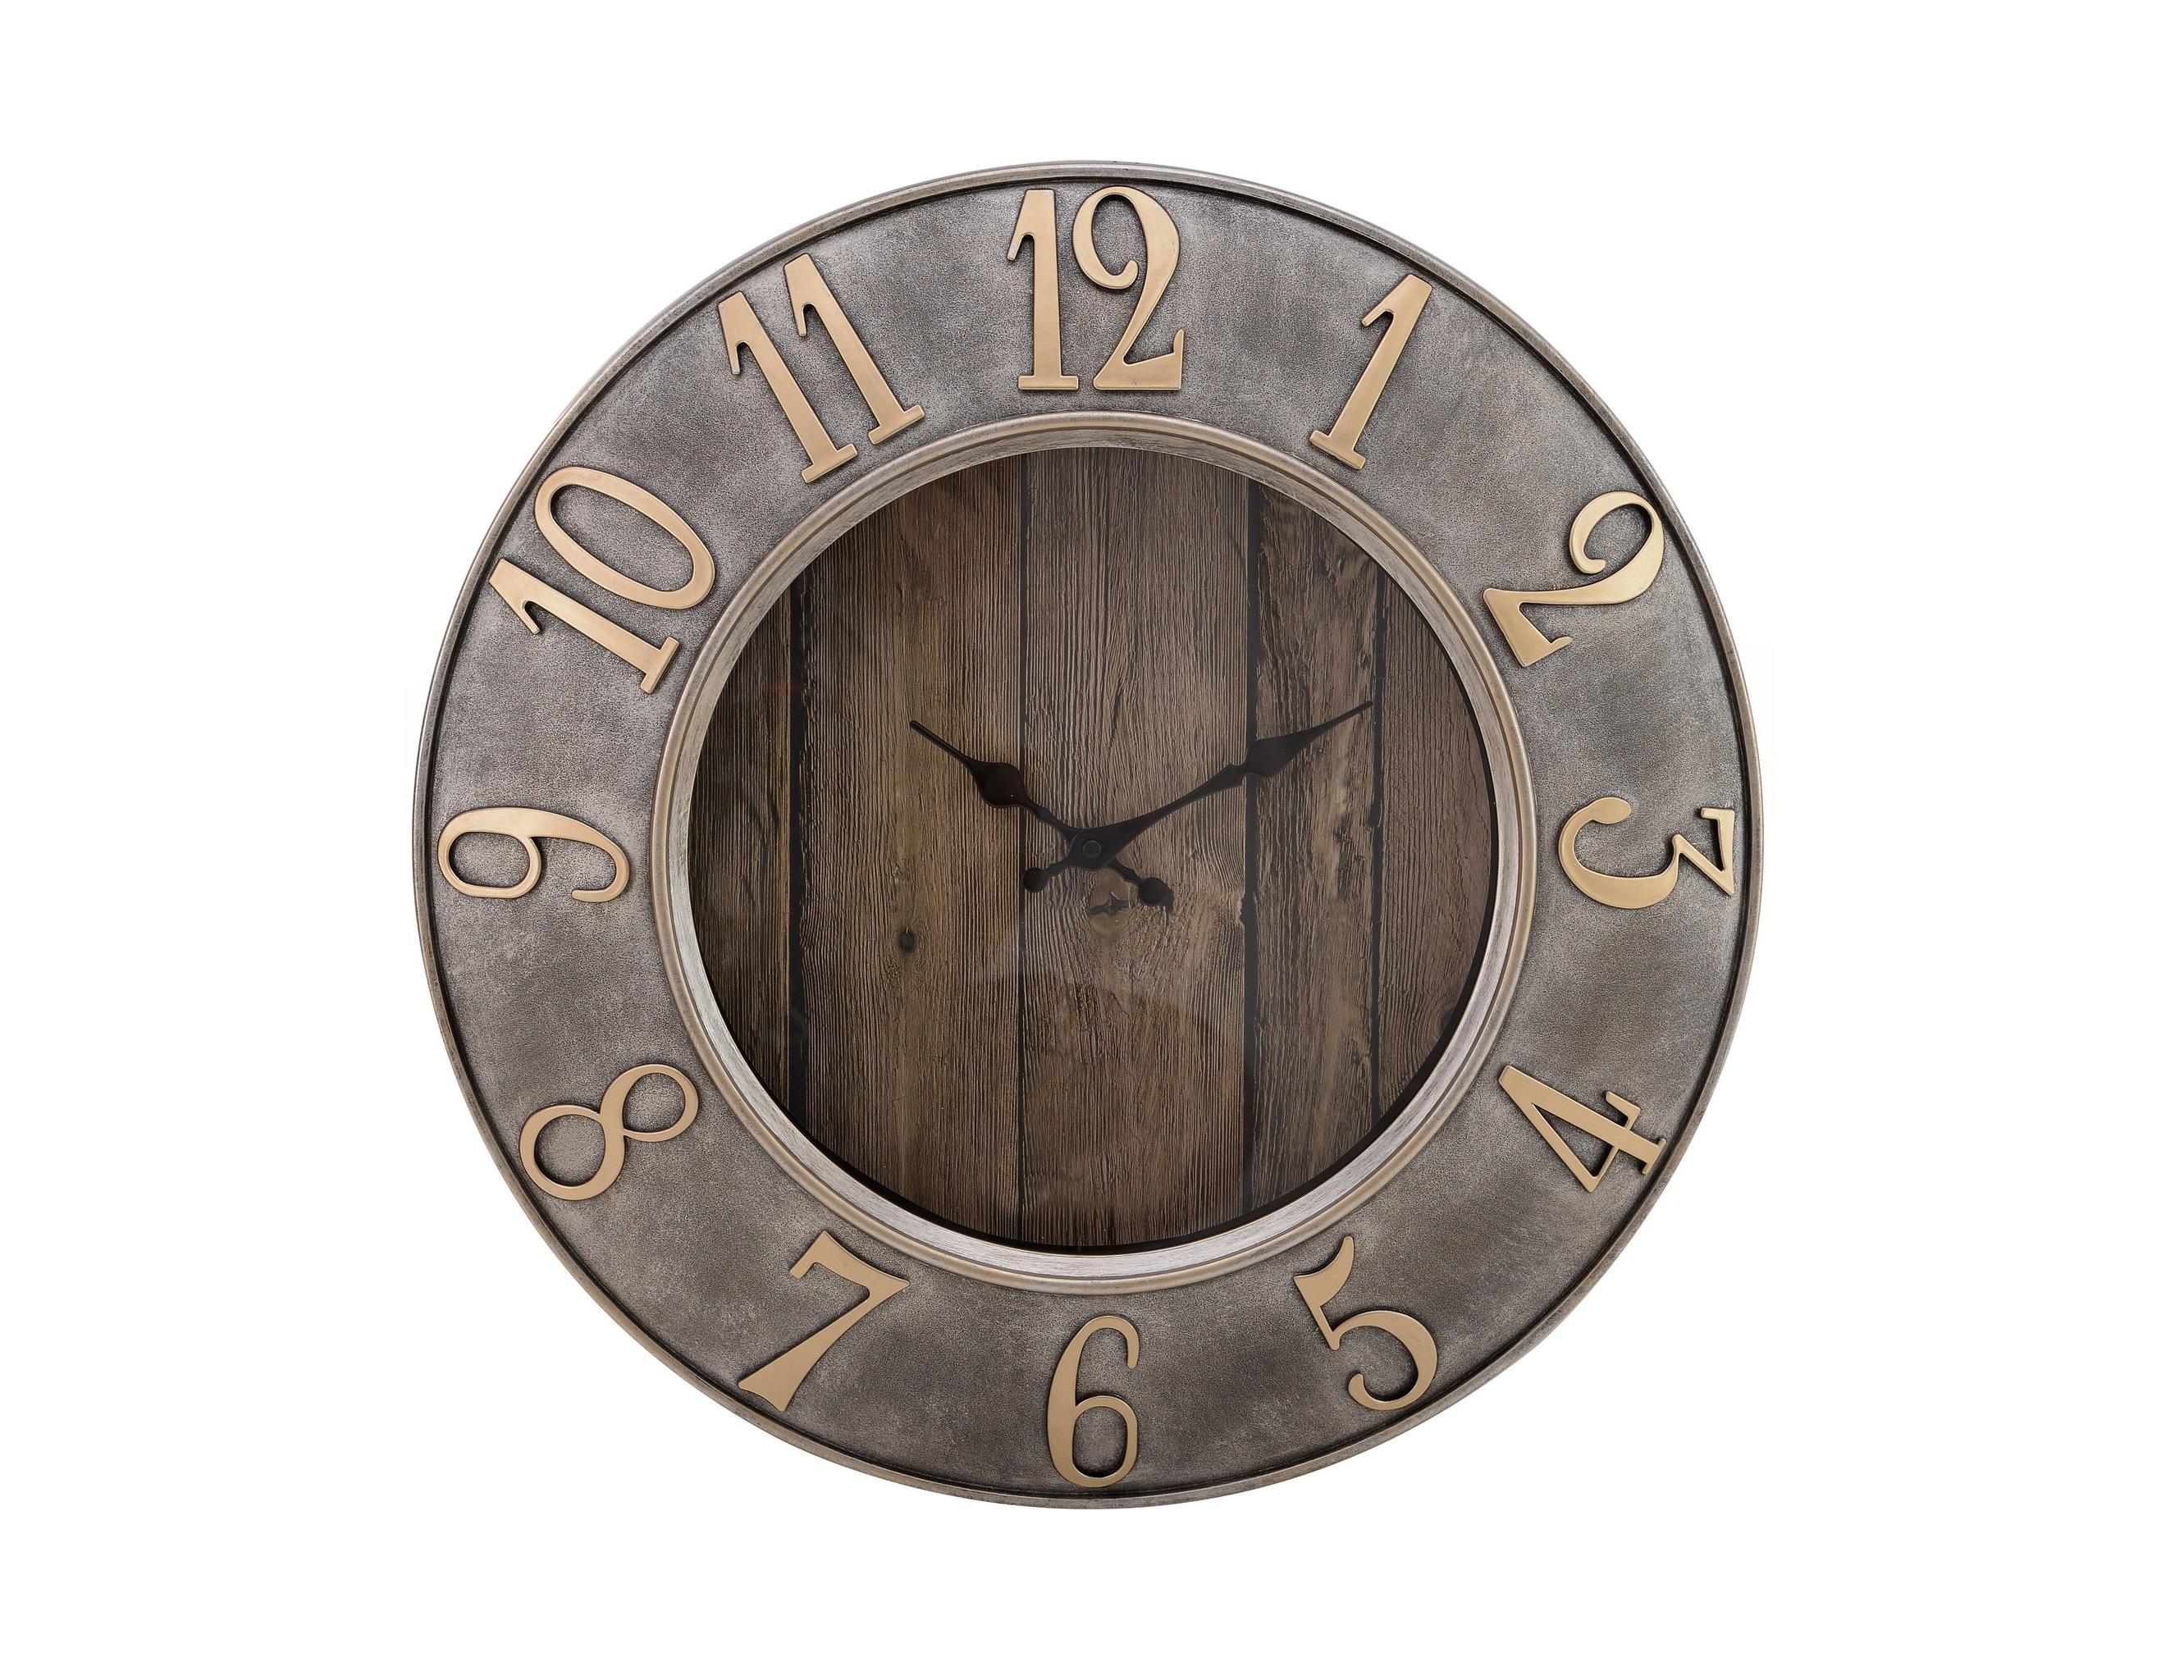 Часы настенные DecrestoНастенные часы<br>Механизм: кварцевый<br><br>Material: Пластик<br>Width см: 50<br>Depth см: 5<br>Height см: 50